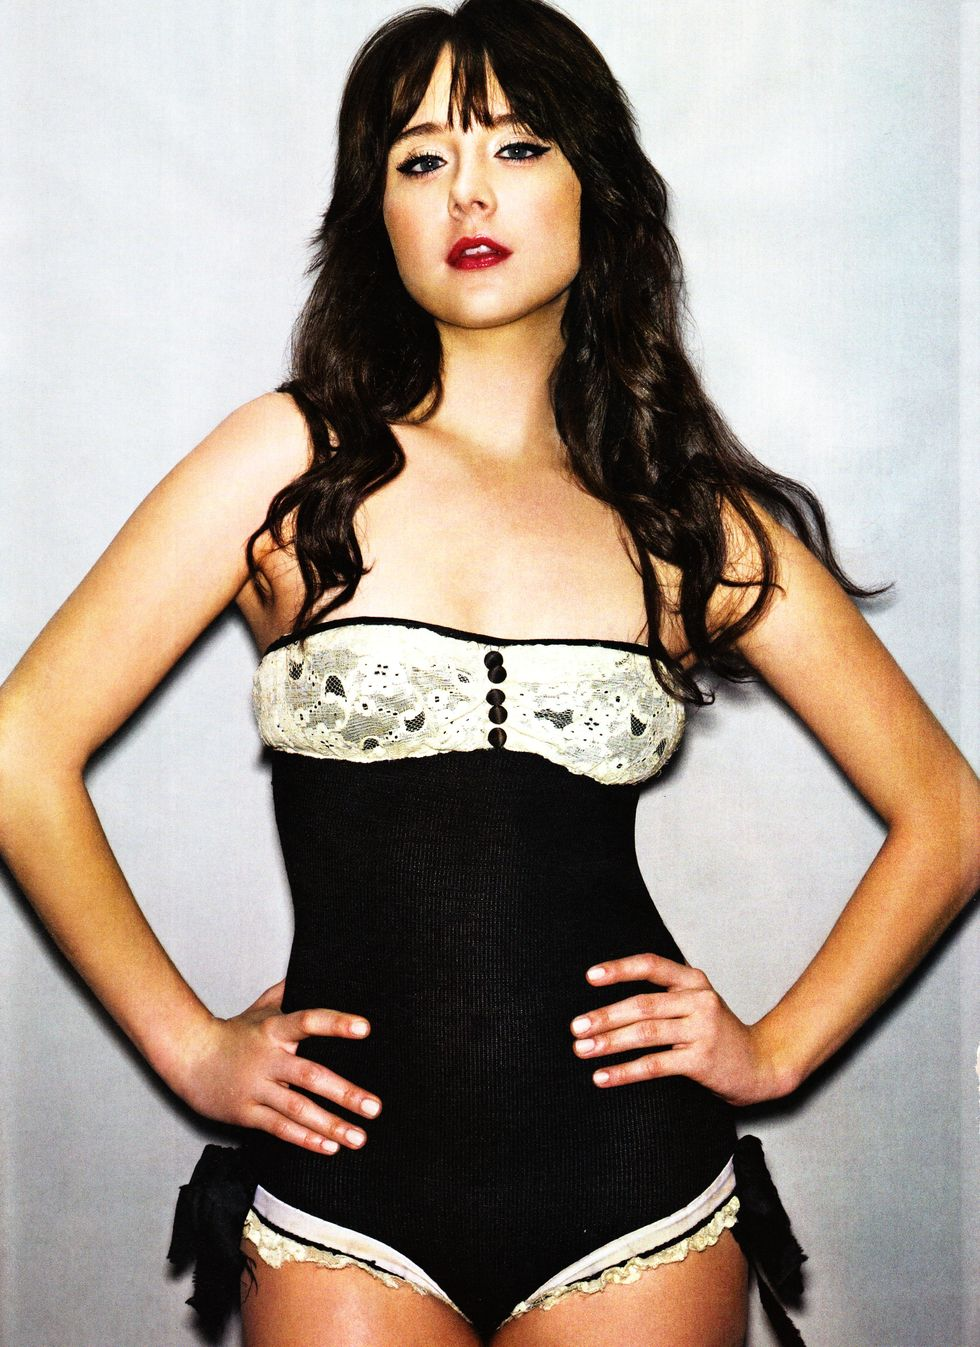 alessandra-torresani-fhm-magazine-february-2010-03